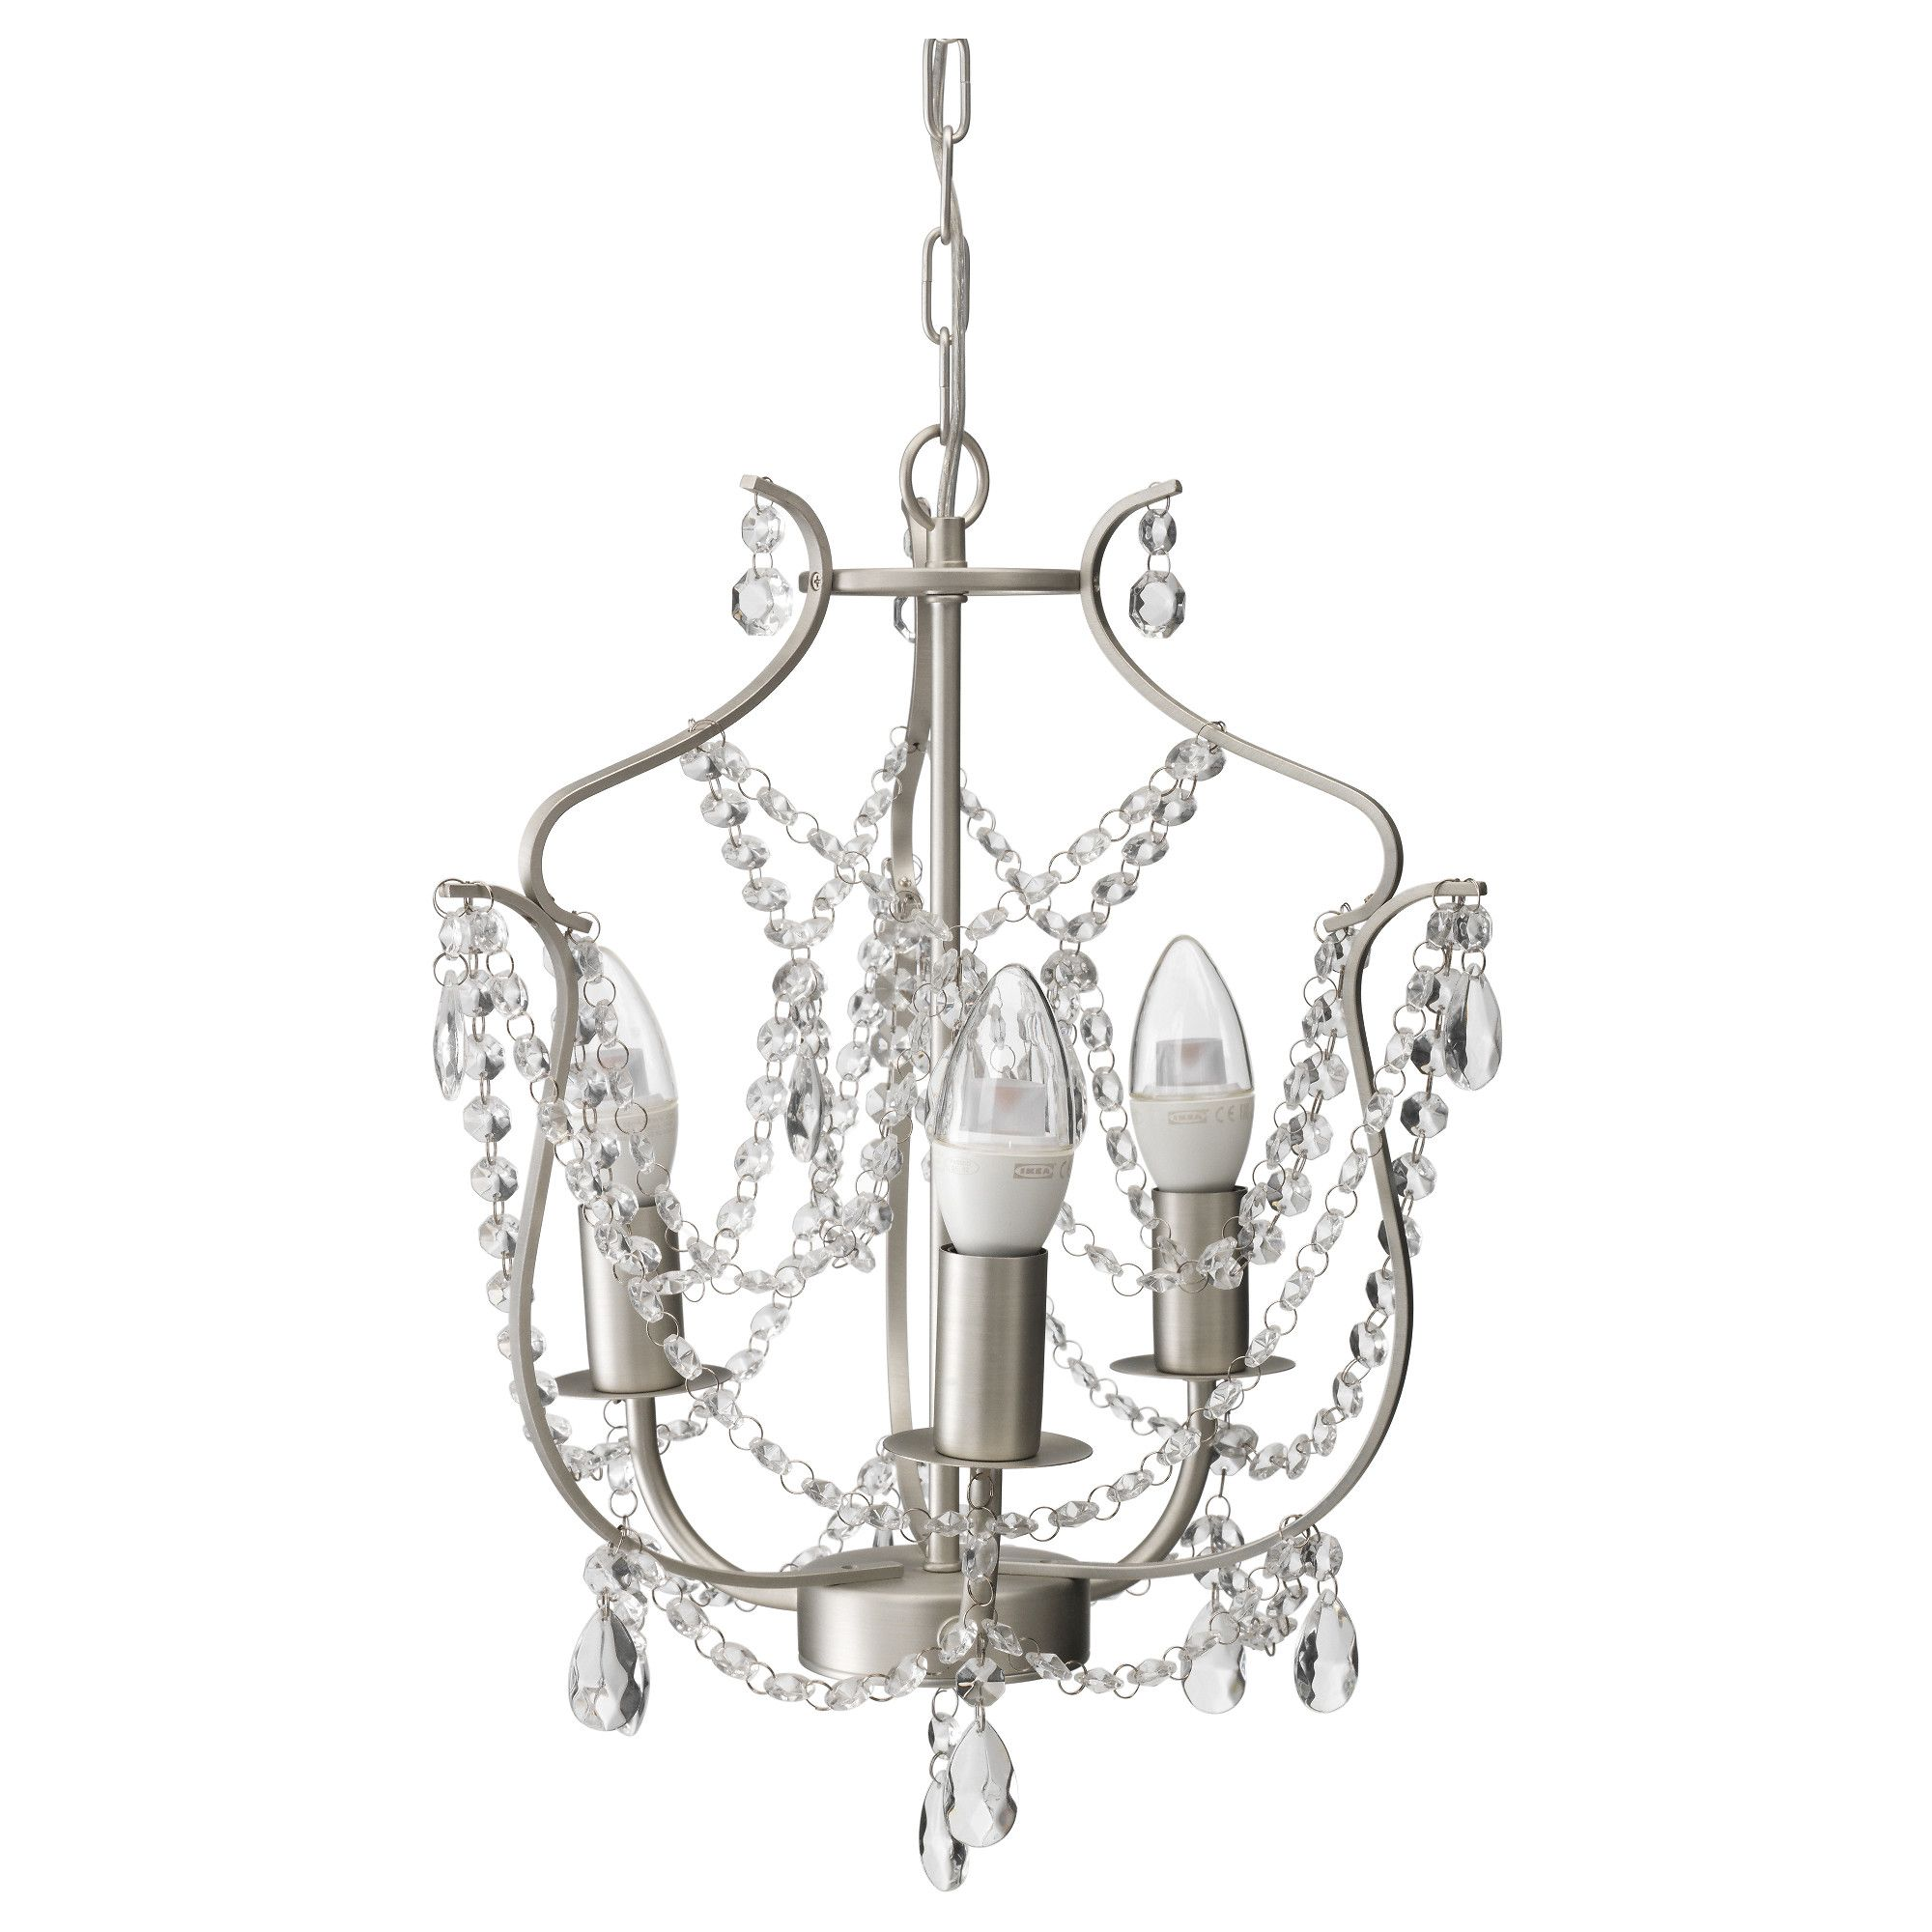 Kristaller Chandelier 3 Armed Silver Color Glass Ikea Chandelier Ceiling Lamps Bedroom Ceiling Pendant Lights